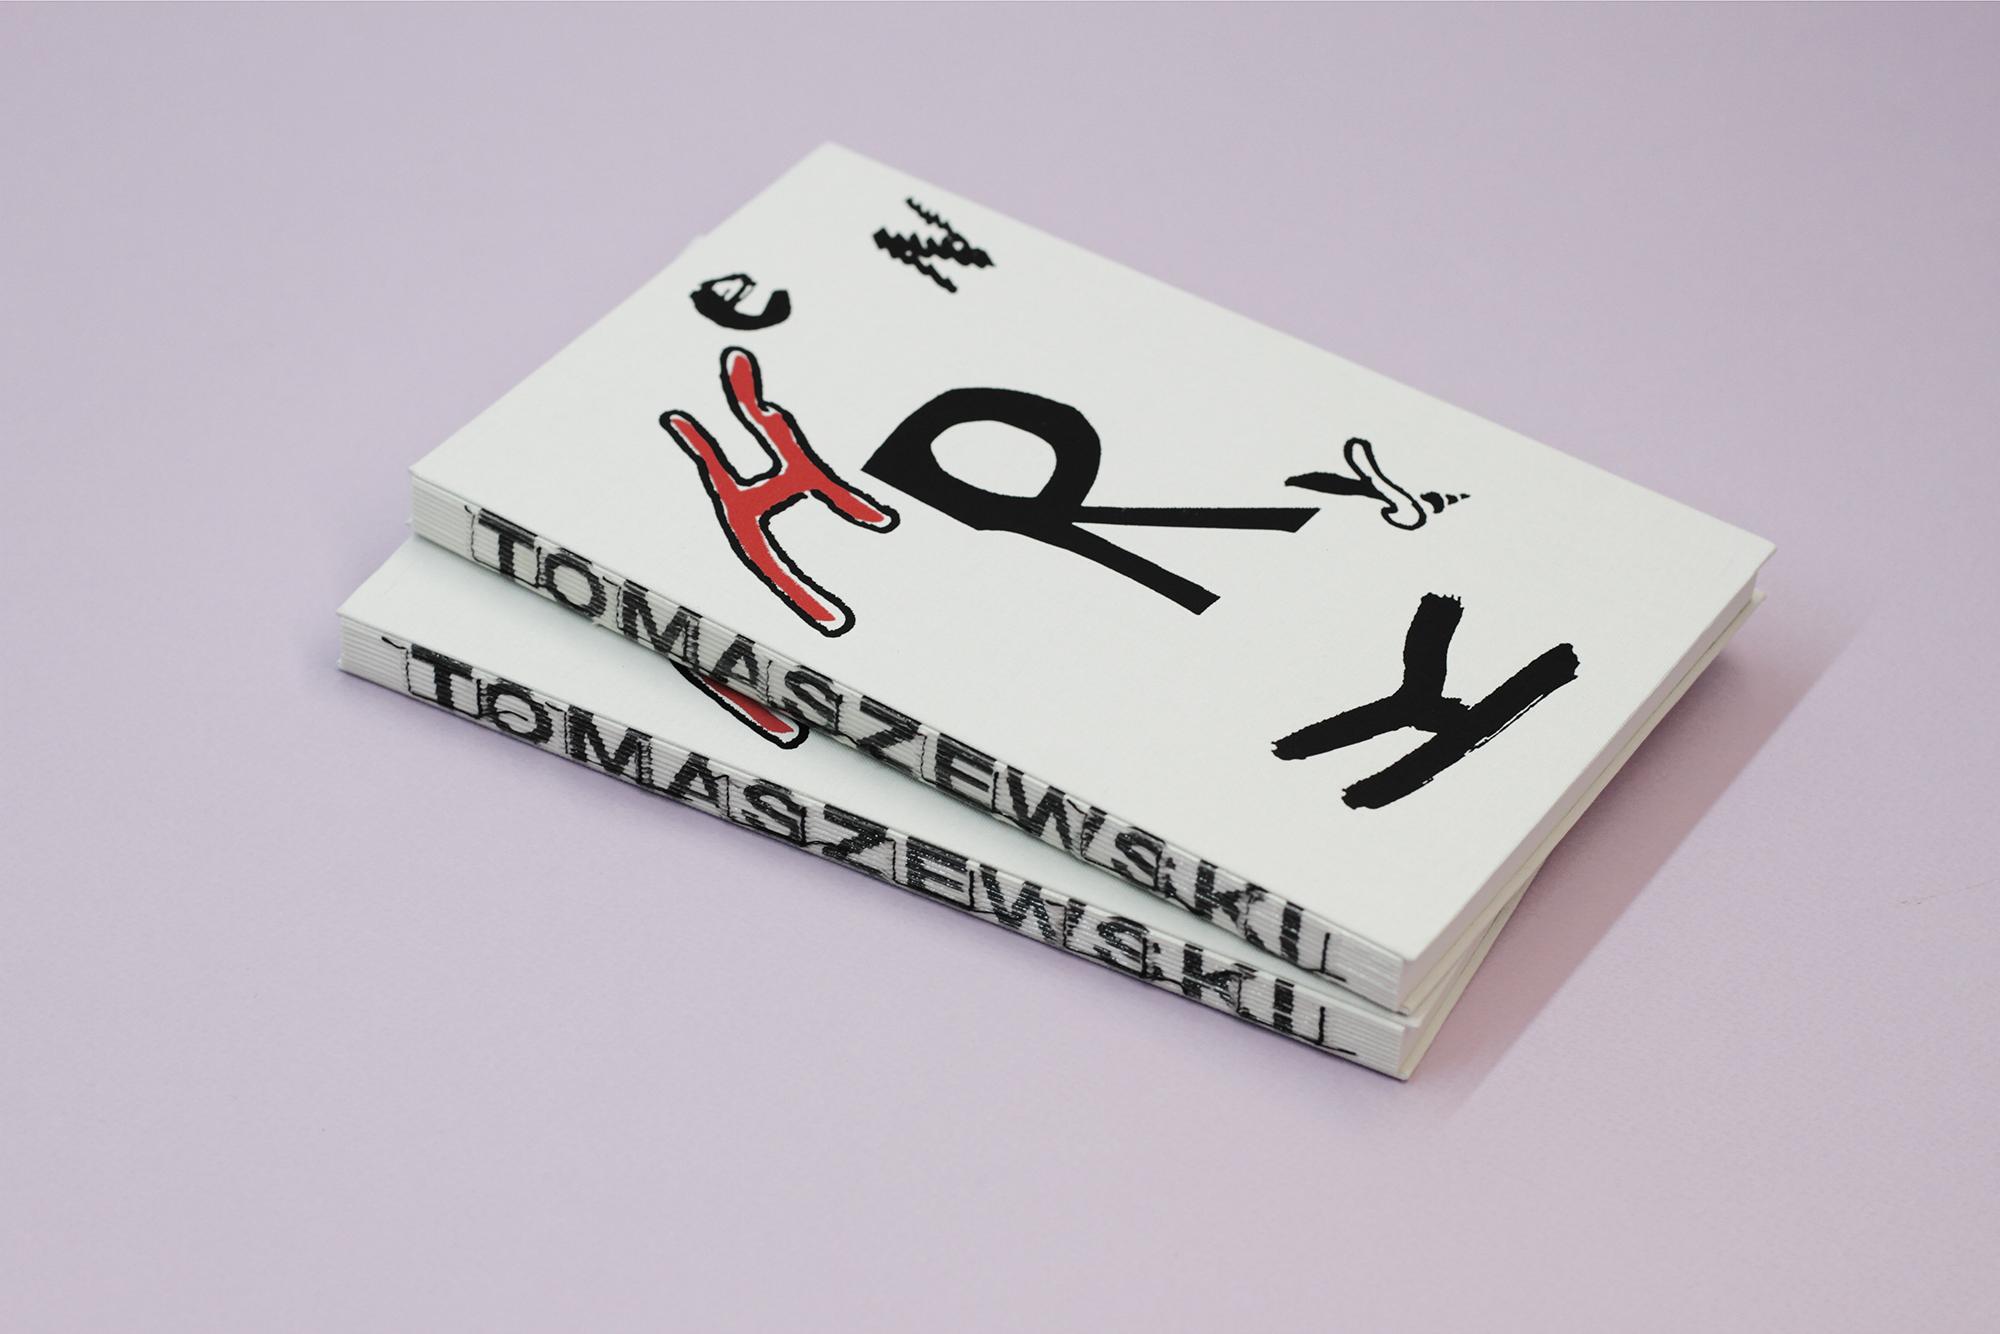 tomaszewski_04.png